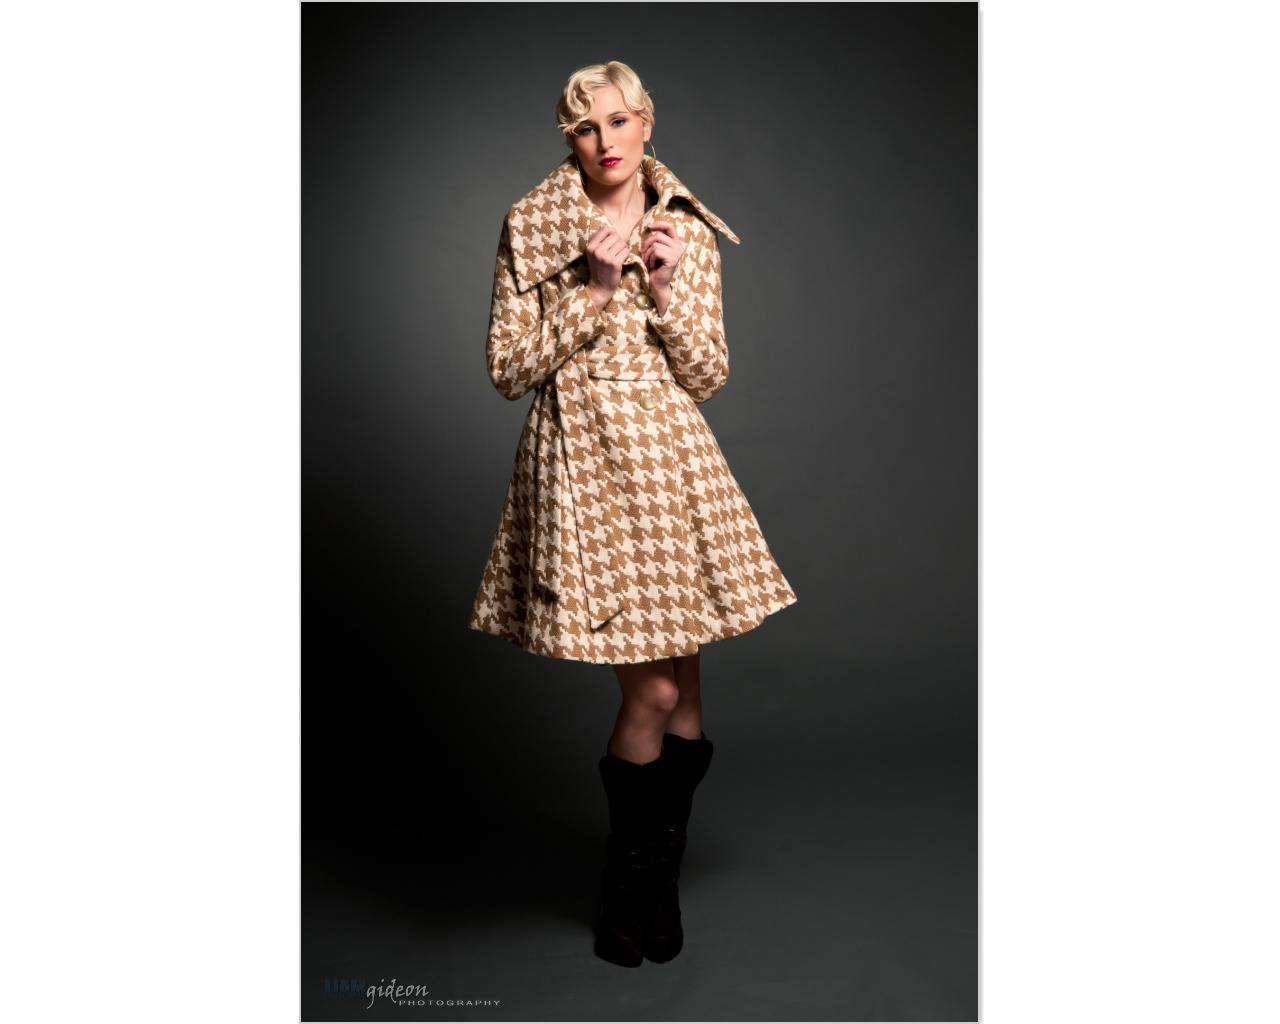 fashion_Page_44